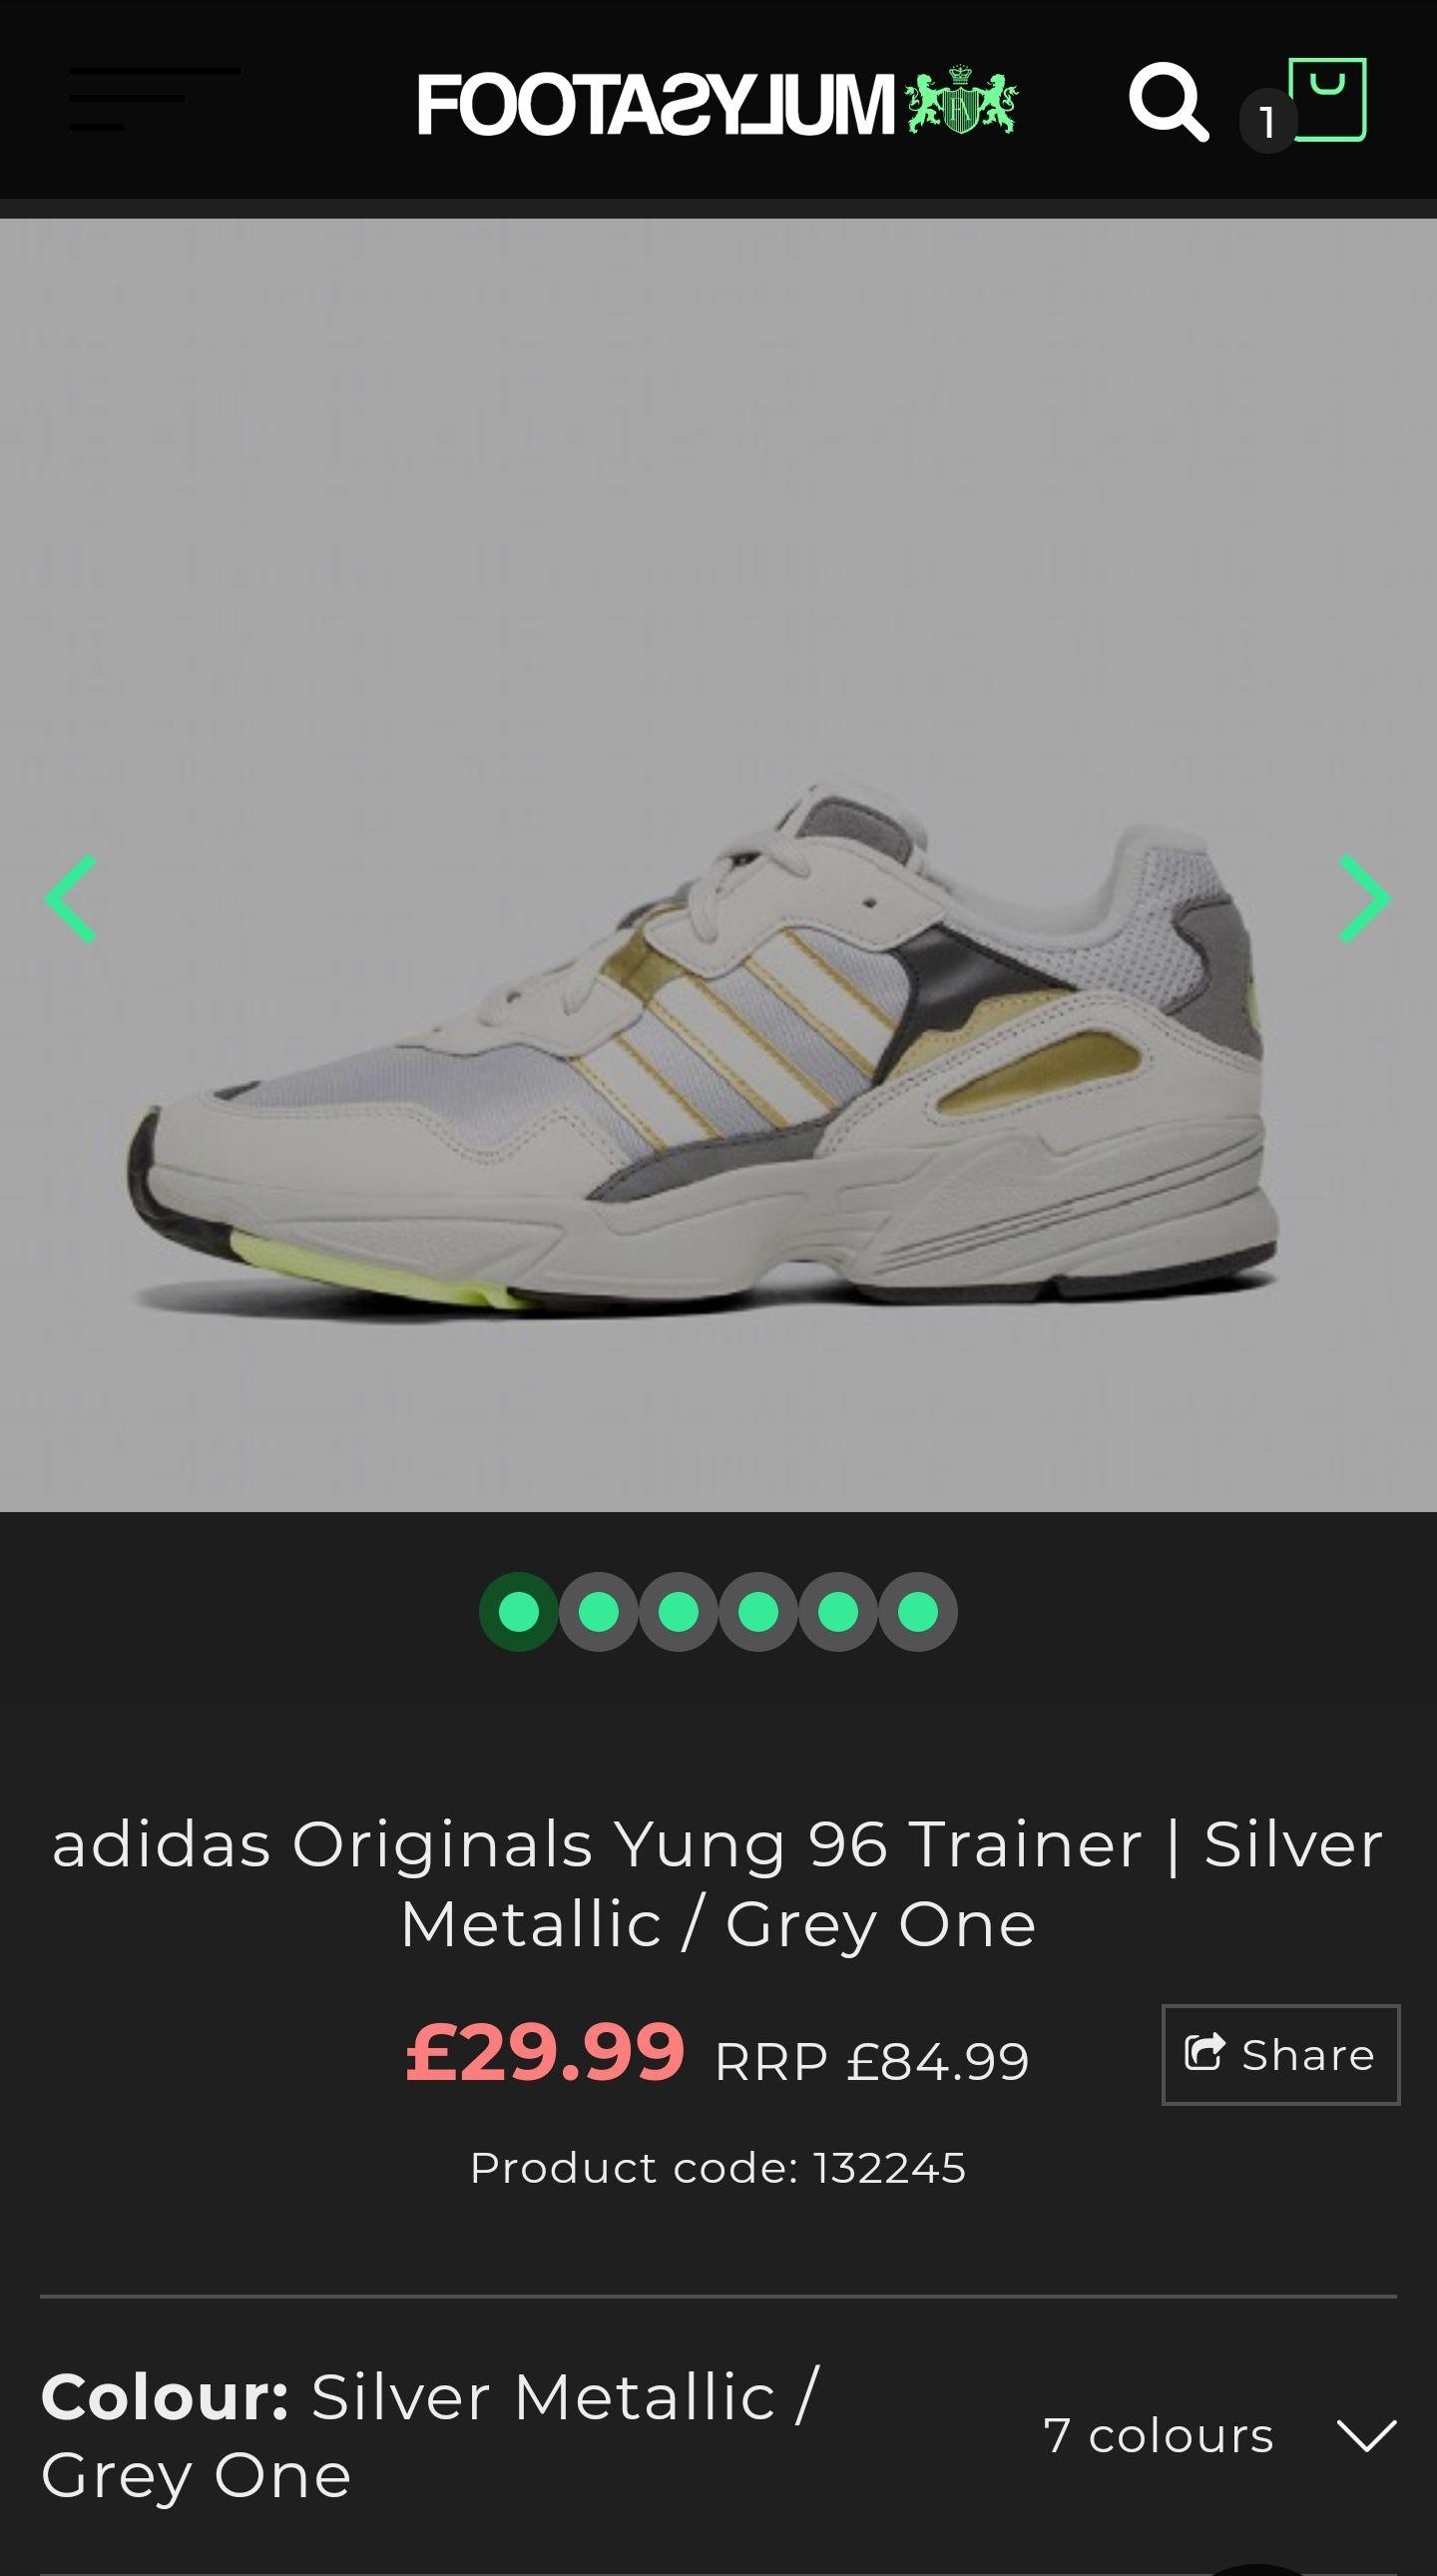 adidas Originals Yung 96 Trainer   Silver Metallic / Grey One